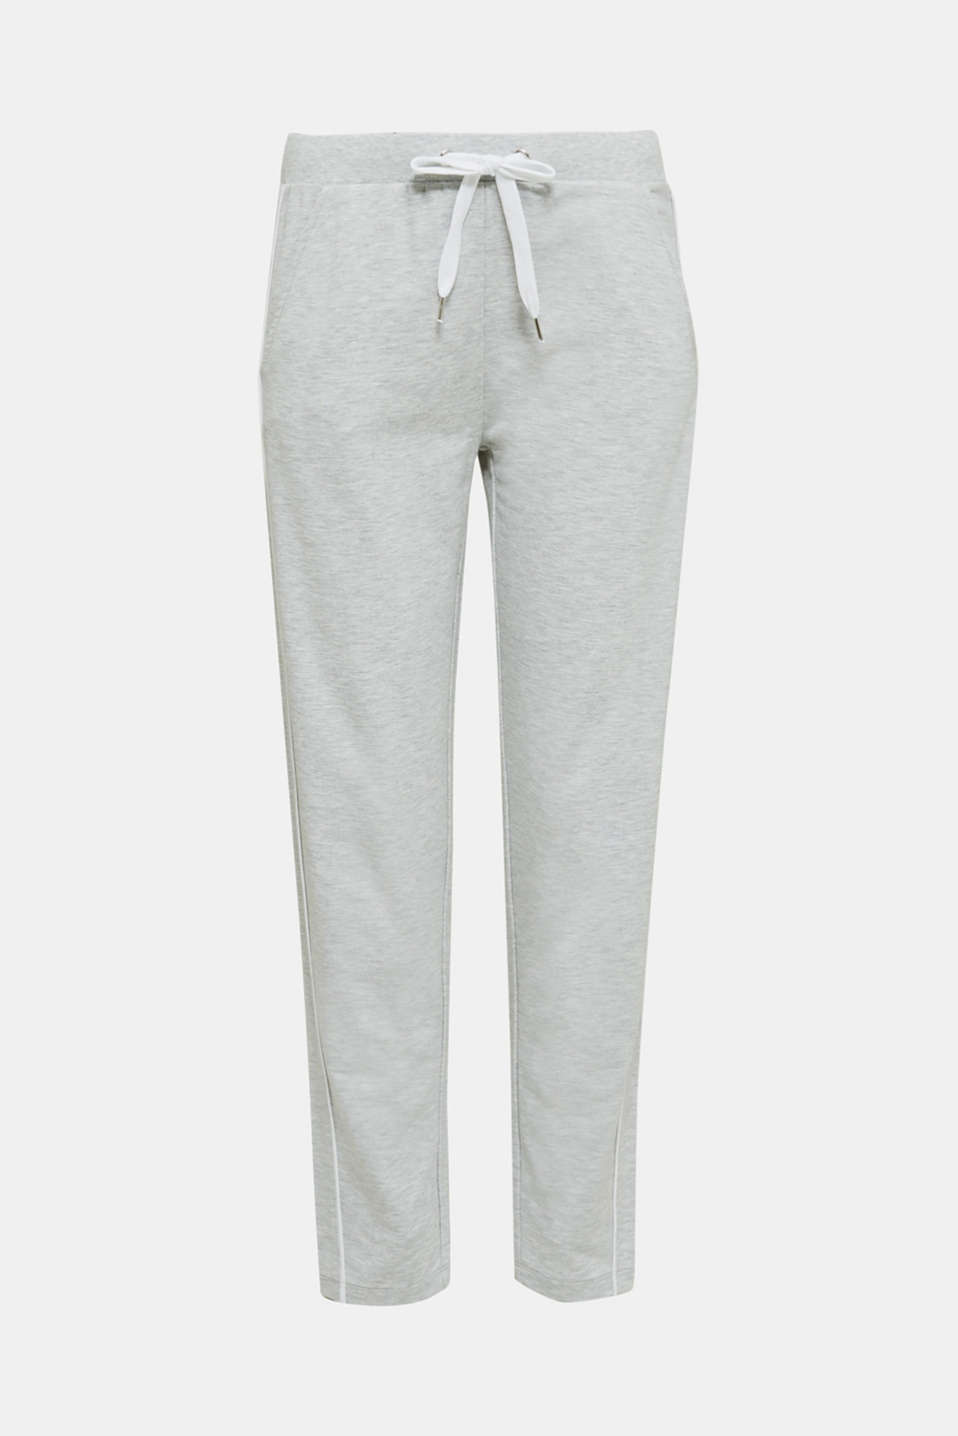 Melange stretch jersey trousers, MEDIUM GREY, detail image number 7